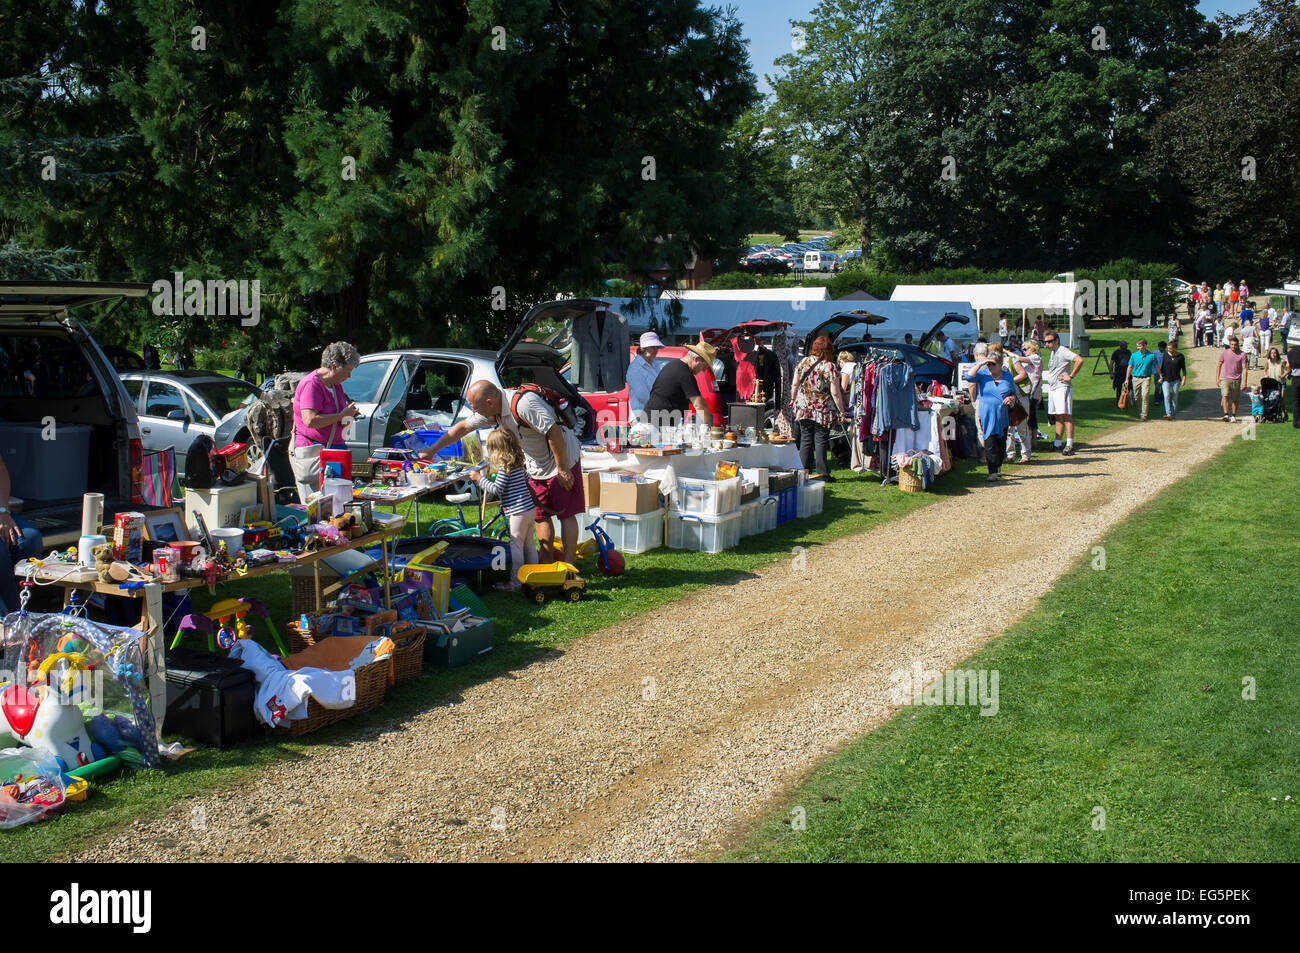 Car boot sale at an english summer fair stock image